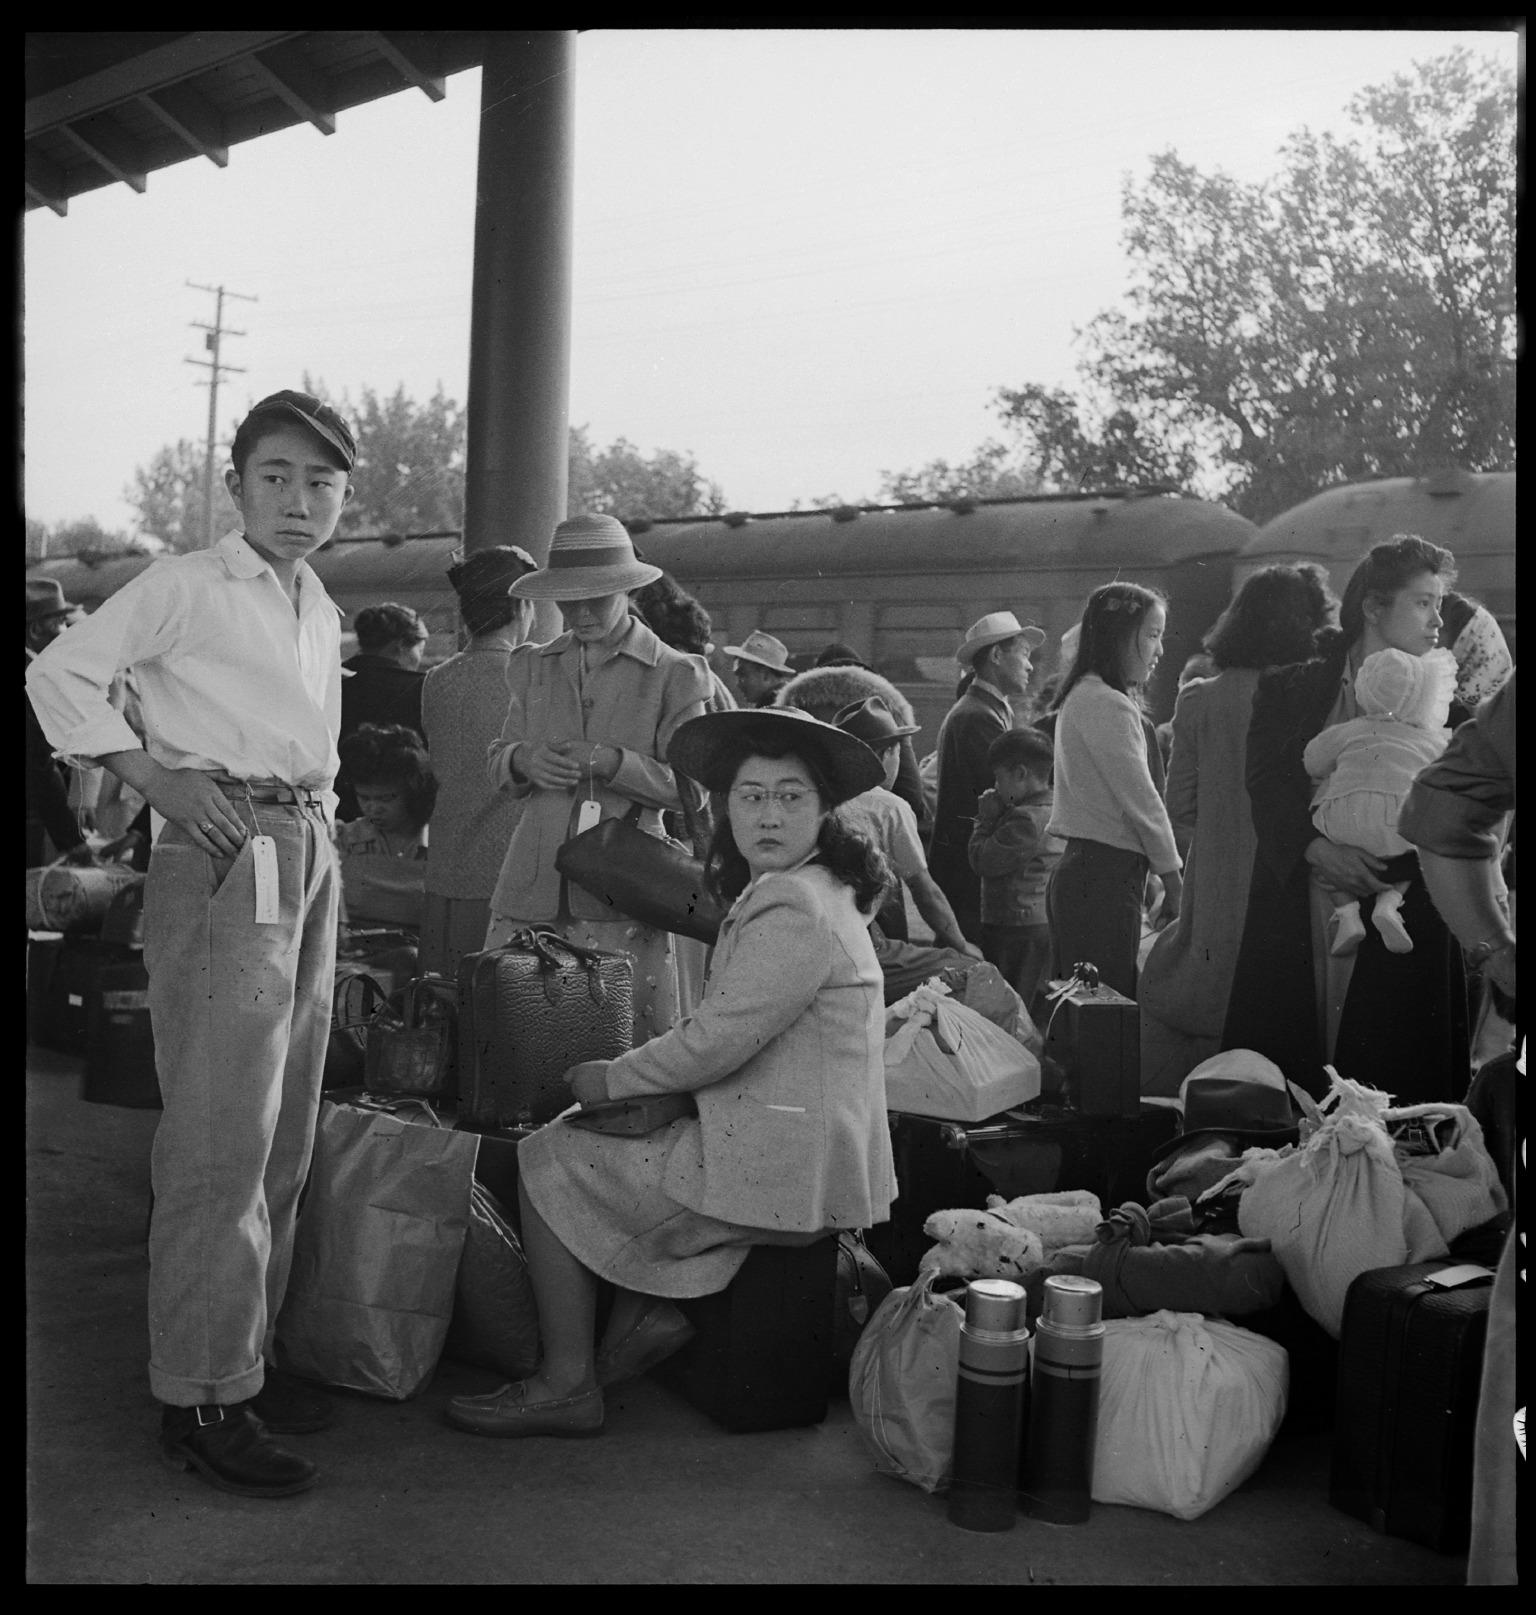 Woodland_CA_Families_of_Japanese_ancestry_with_their_baggage_at_railroad_station_awaiting_NARA_537804.jpg